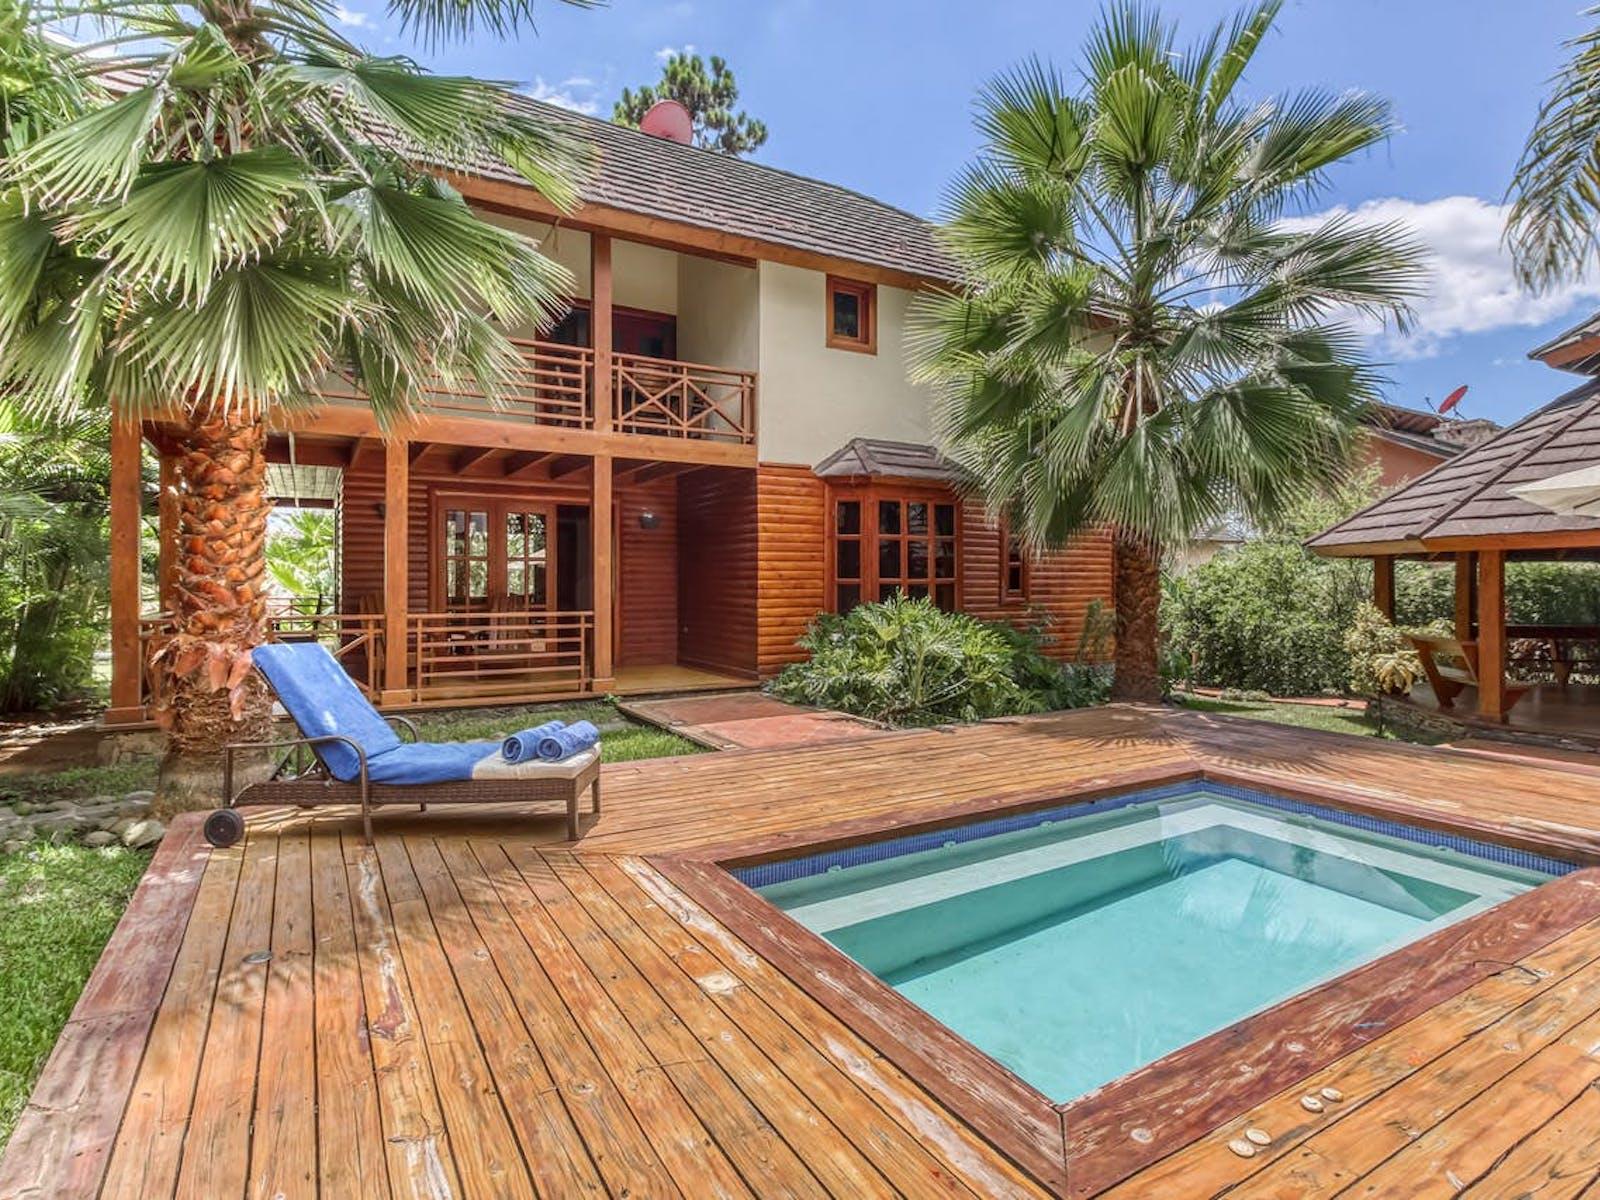 backyard pool of Jarabacoa, La Vega vacation rental surrounded by palm trees